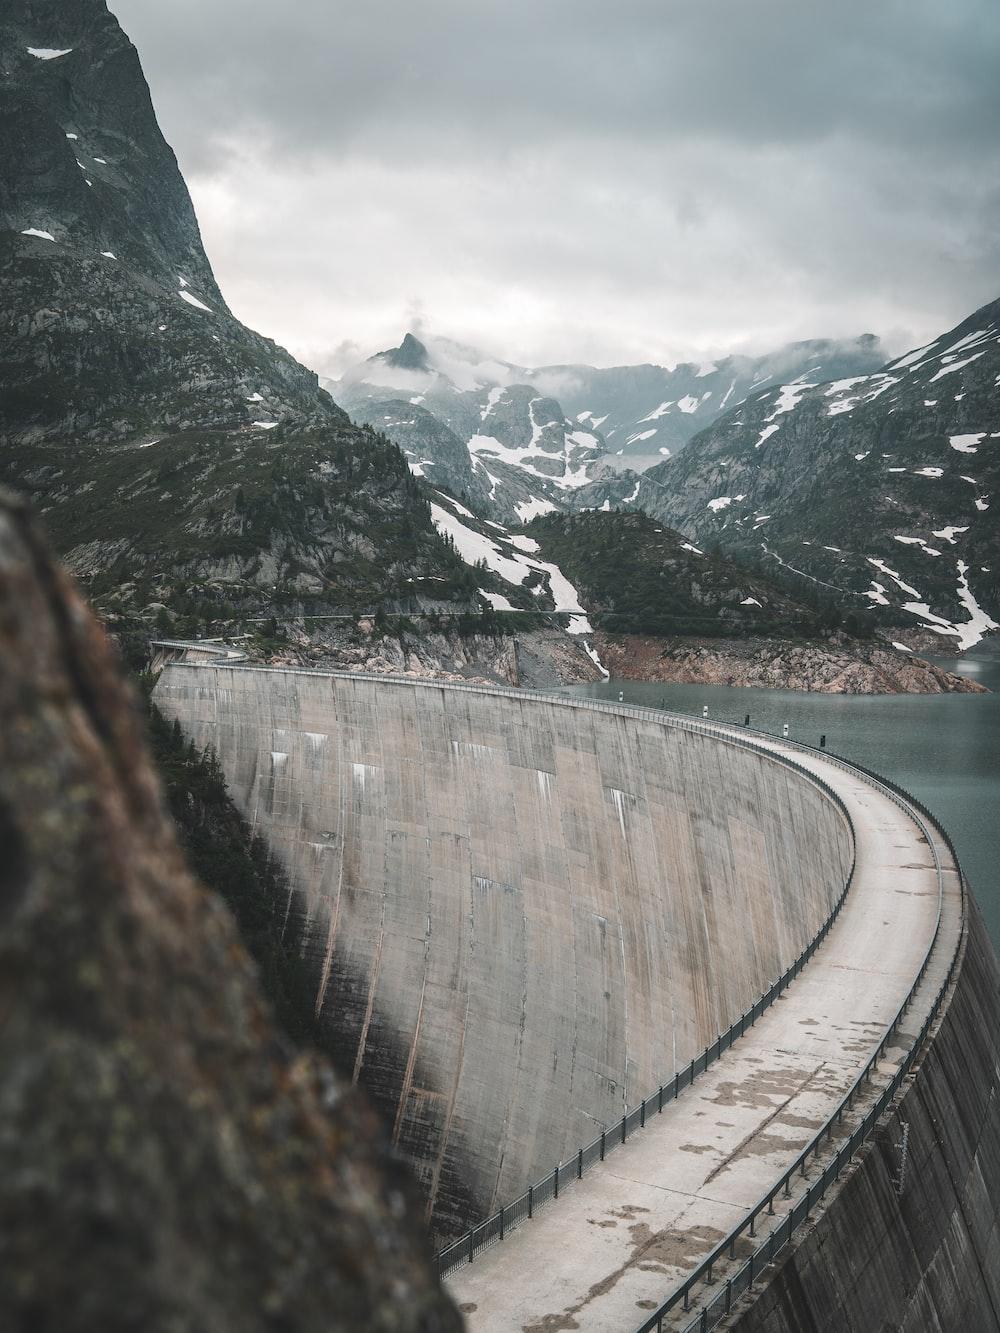 close up photography of dam near mountain